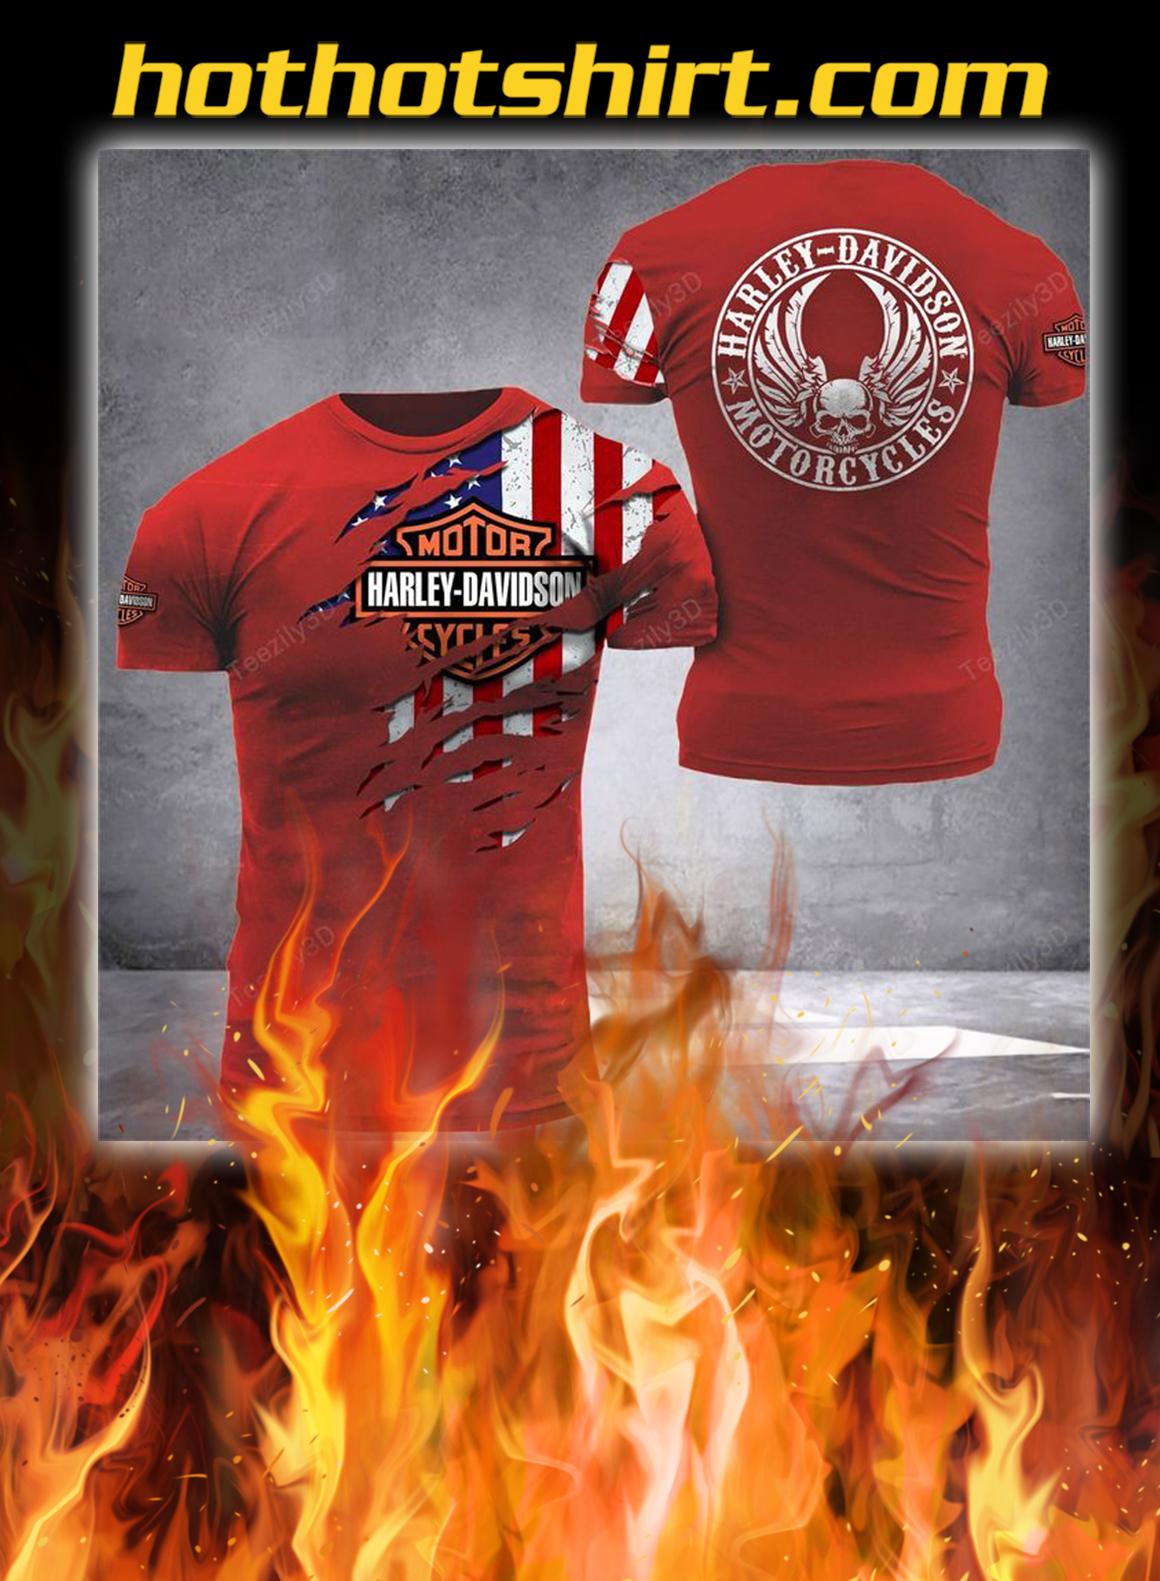 Harley davidson american flag camo 3d shirt- red